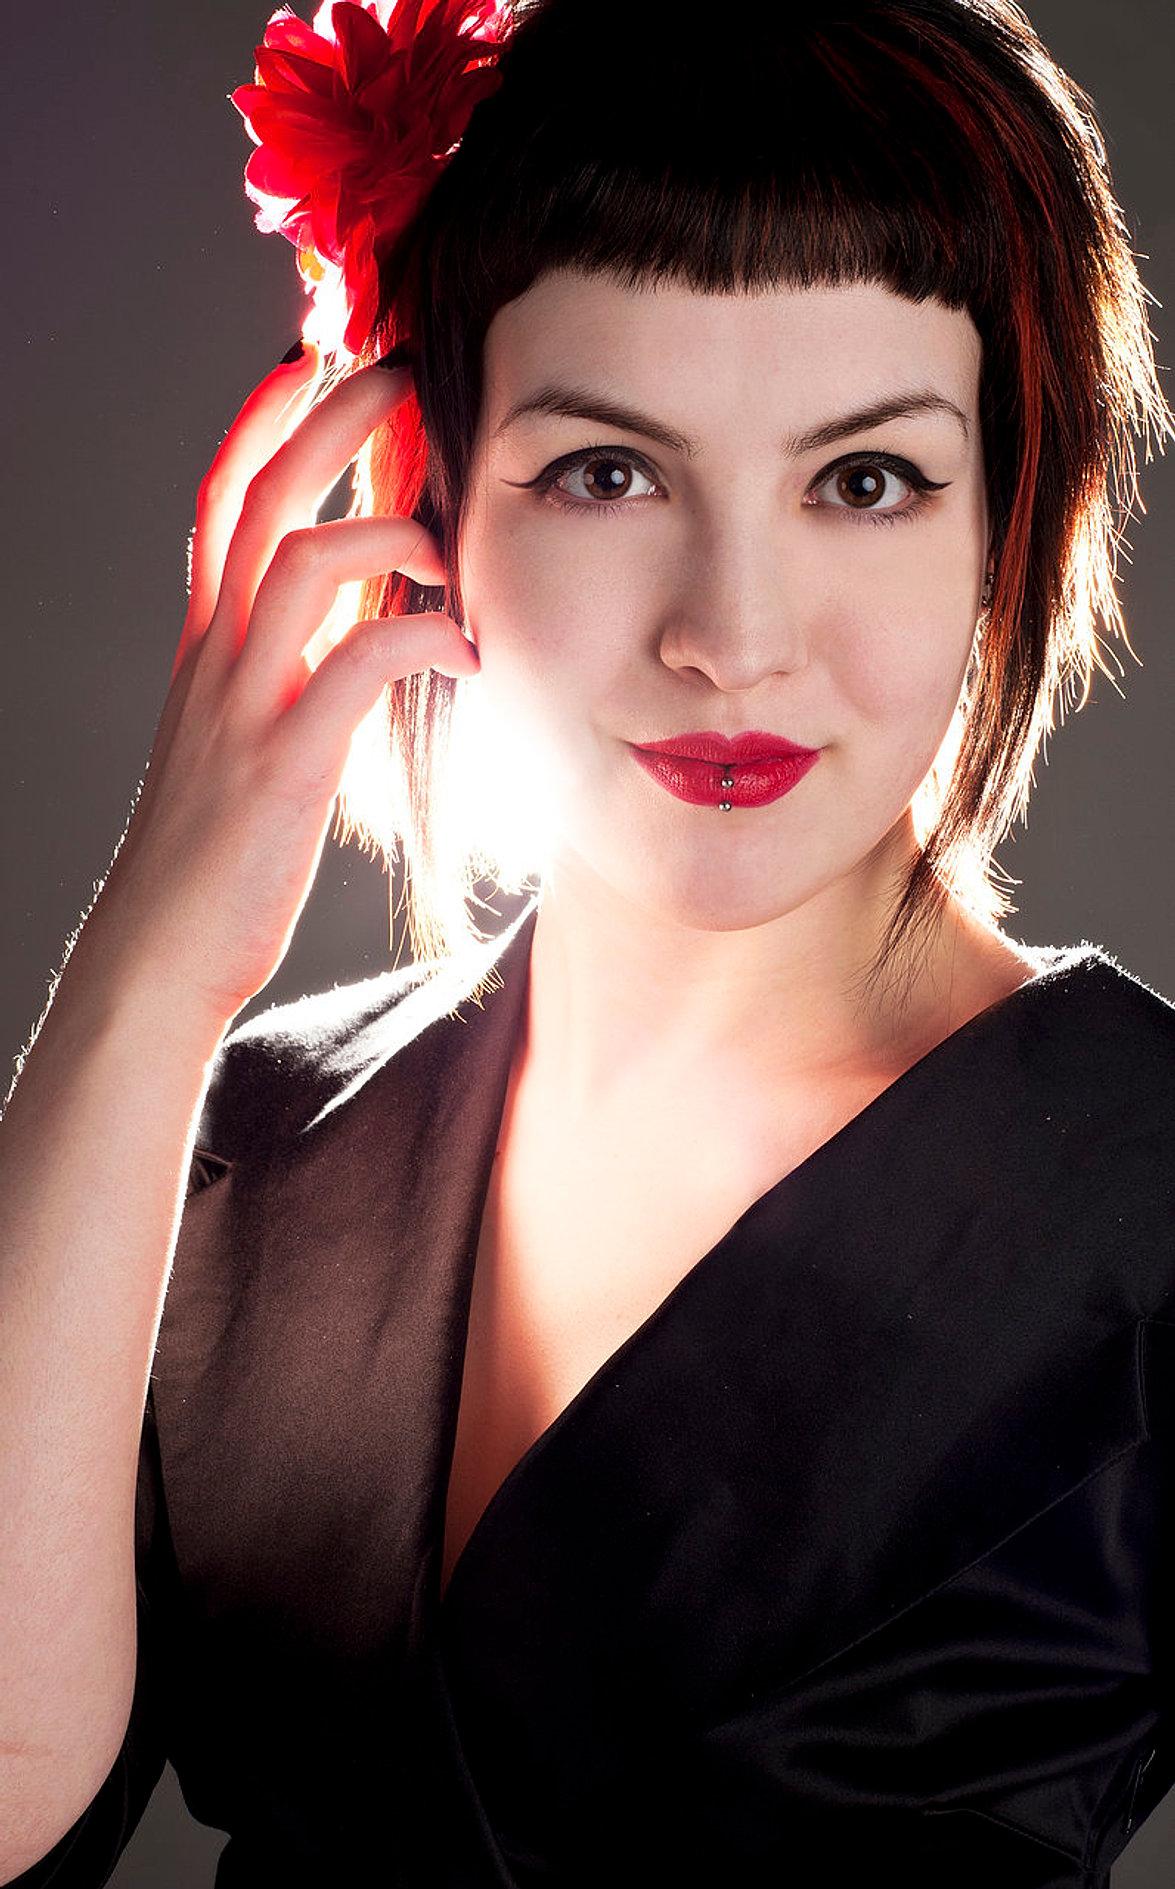 Portrait Photographer in Winnipeg